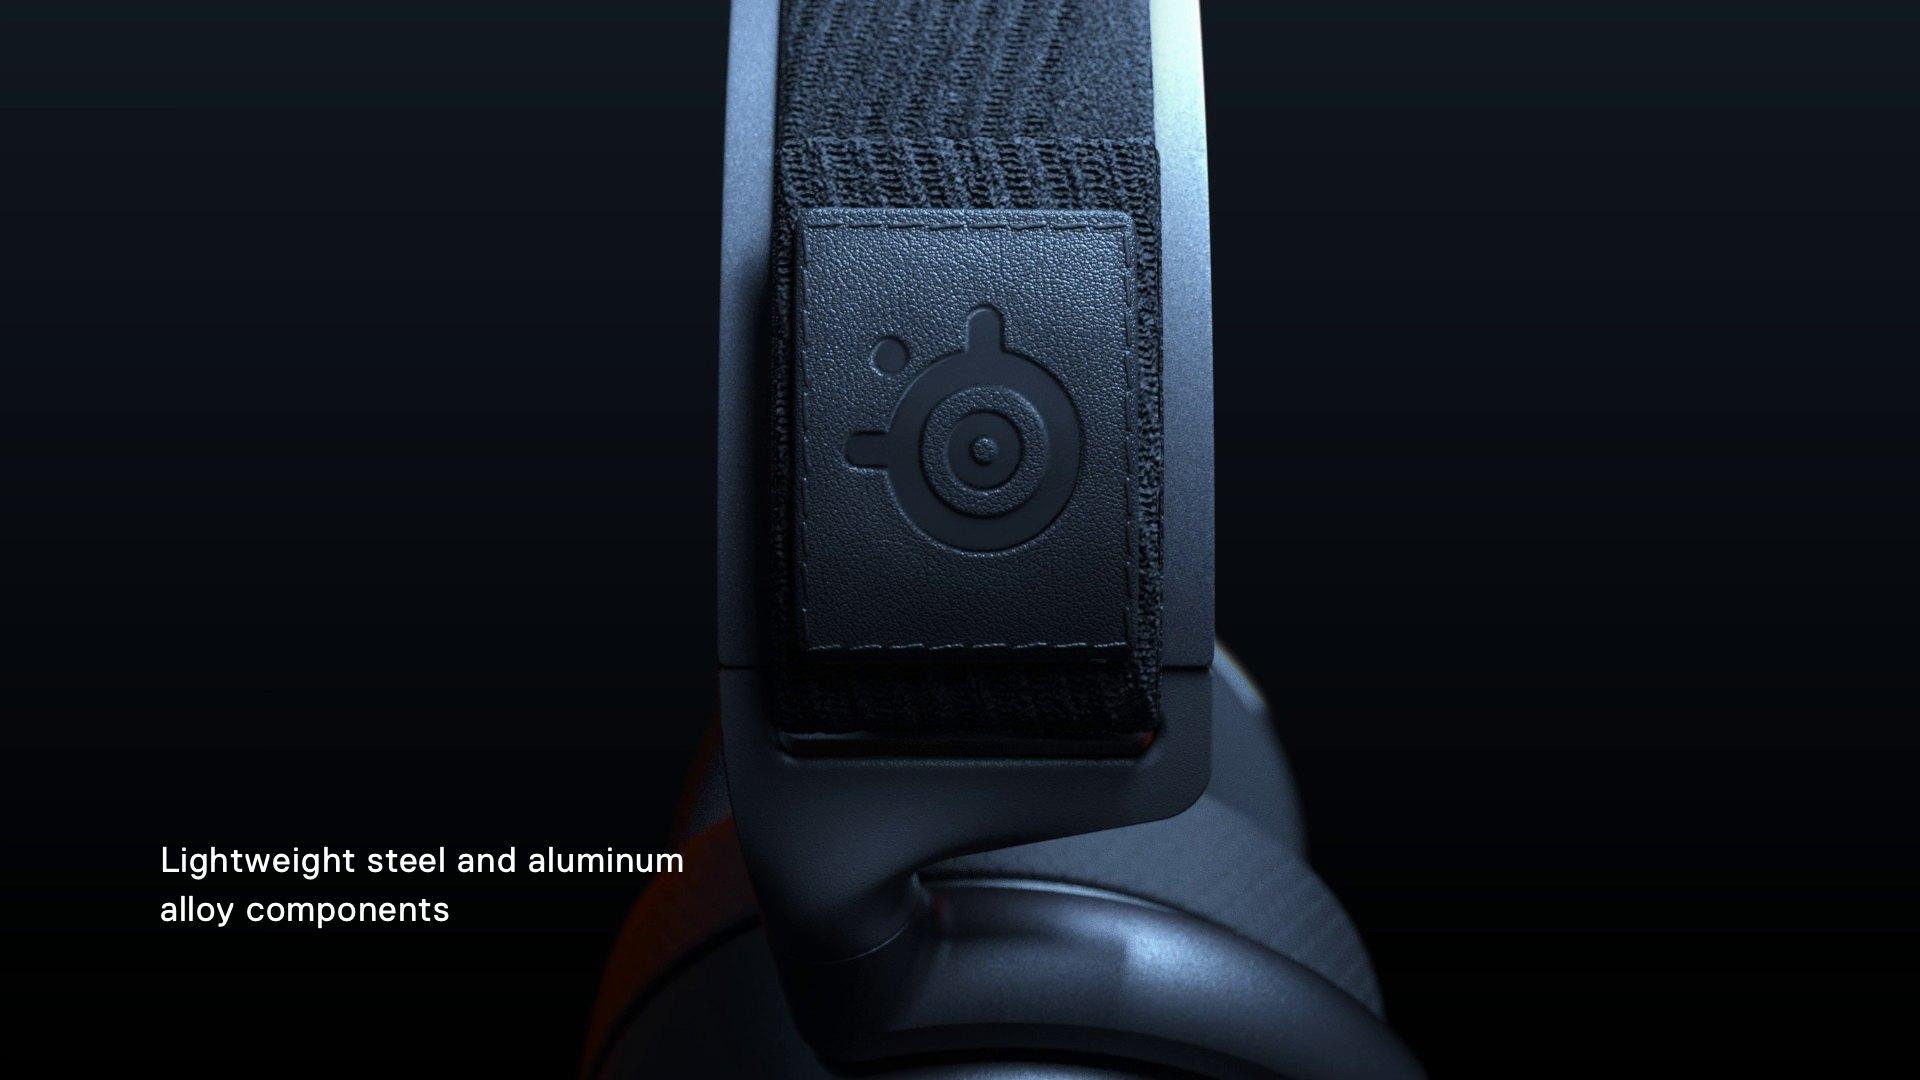 Khung của Tai nghe SteelSeries Arctis Pro+GameDAC 61453